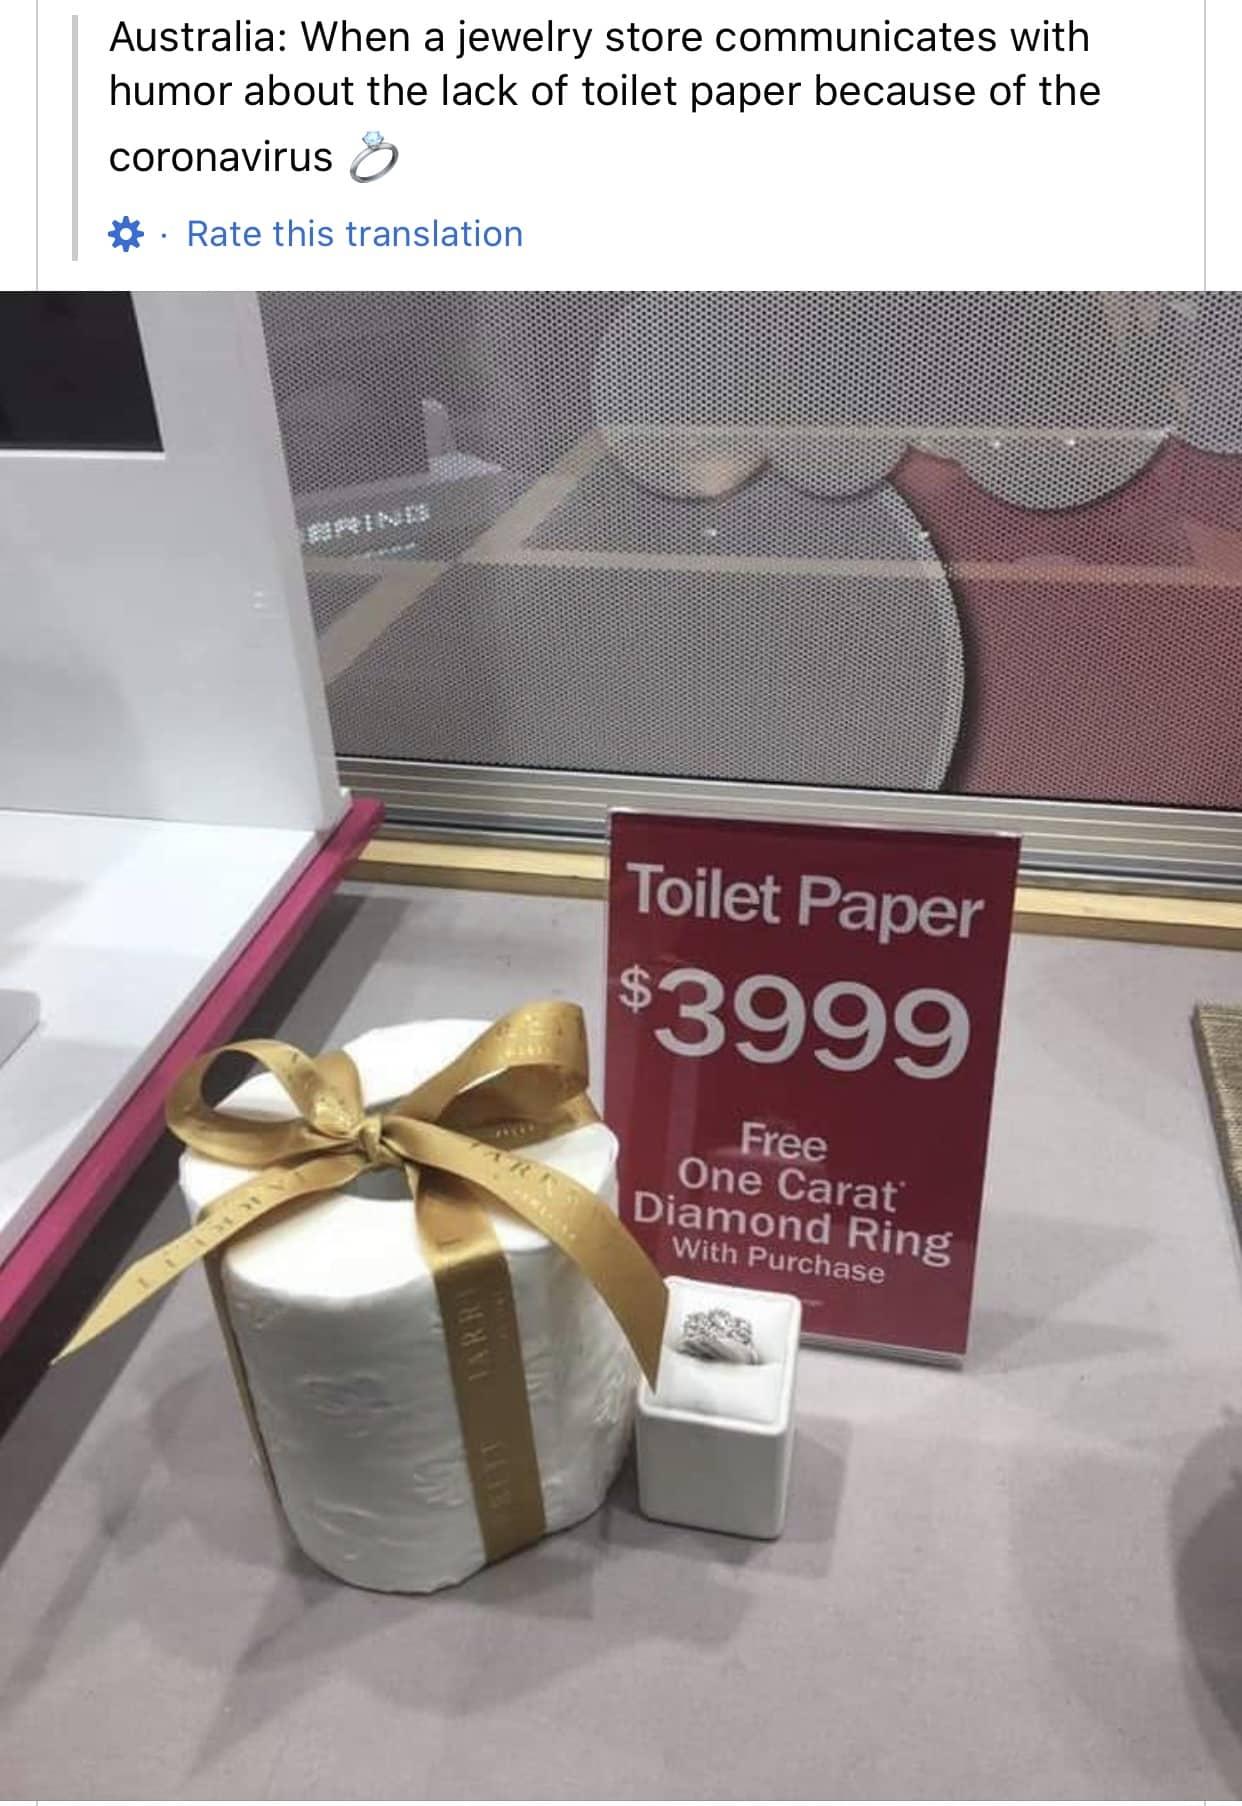 toilet paper memes, coronavirus toilet paper memes